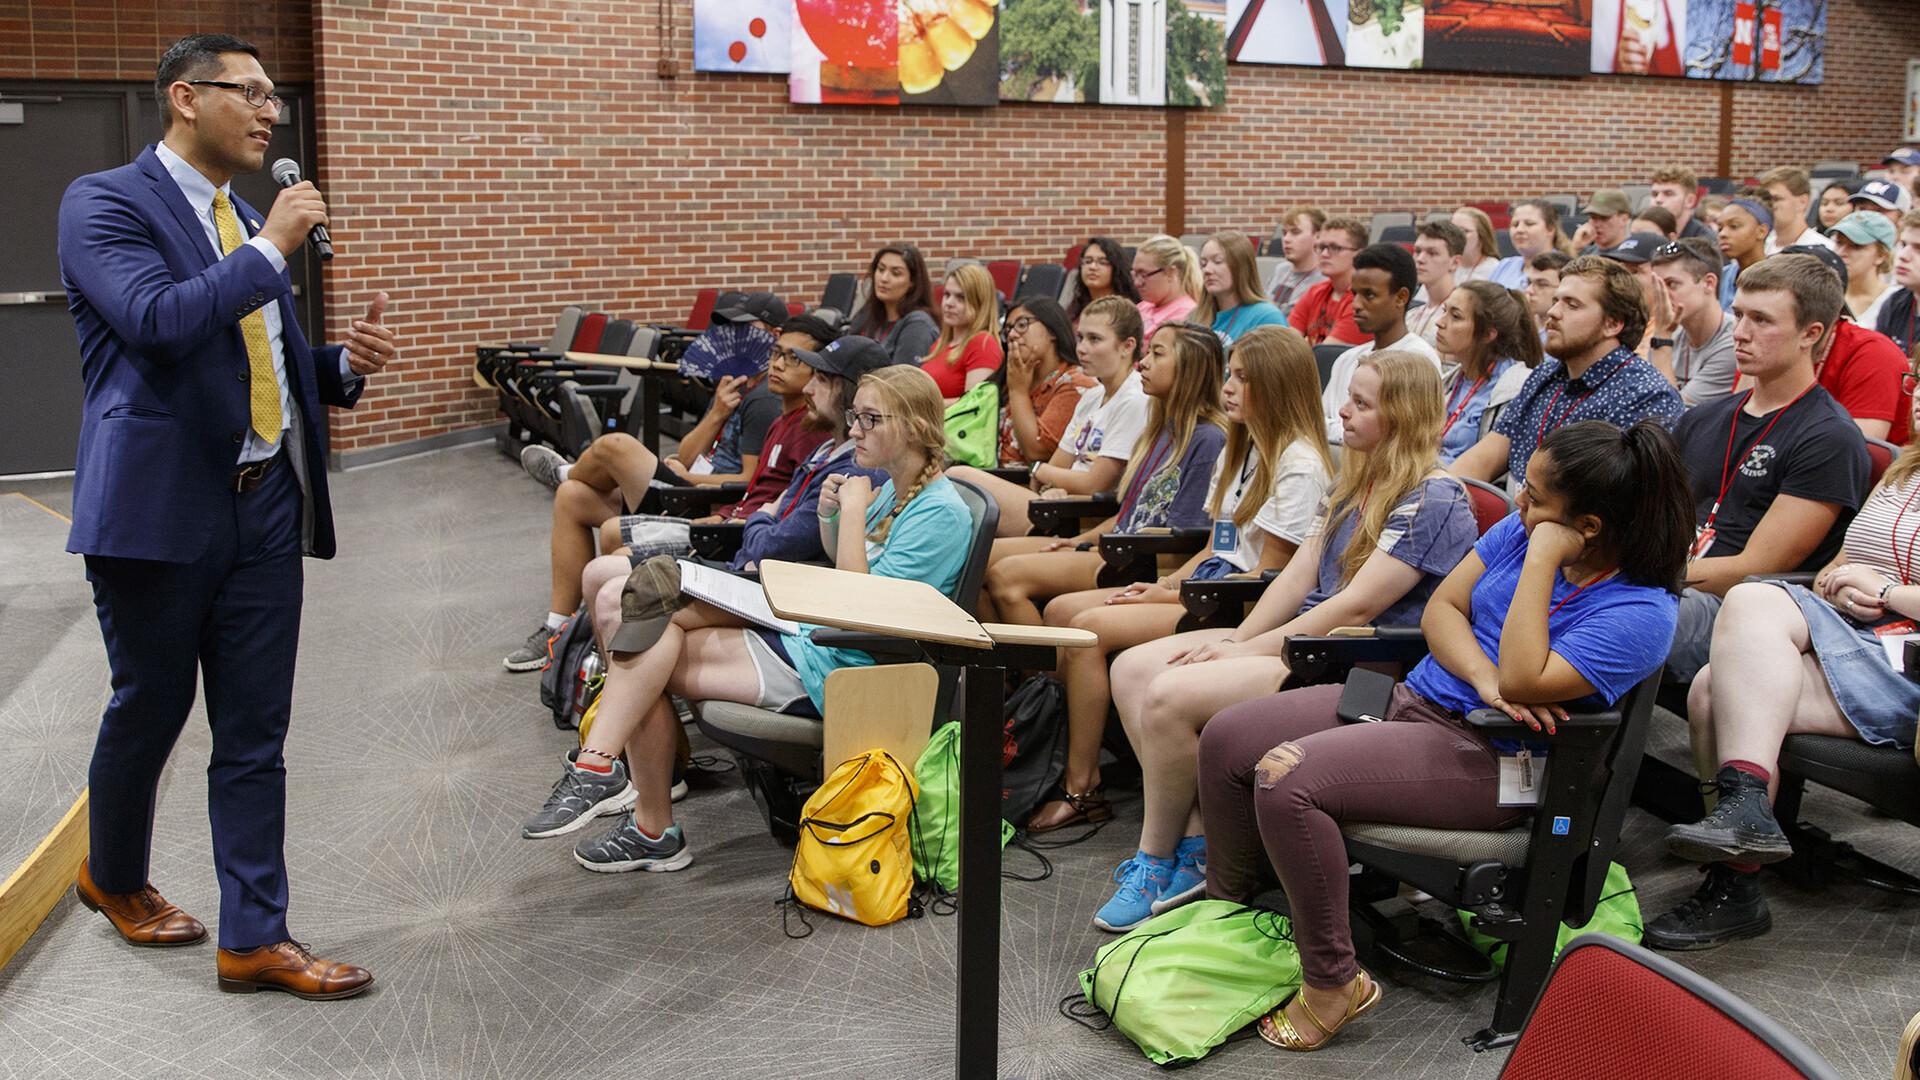 First Huskers program resonates with state senator